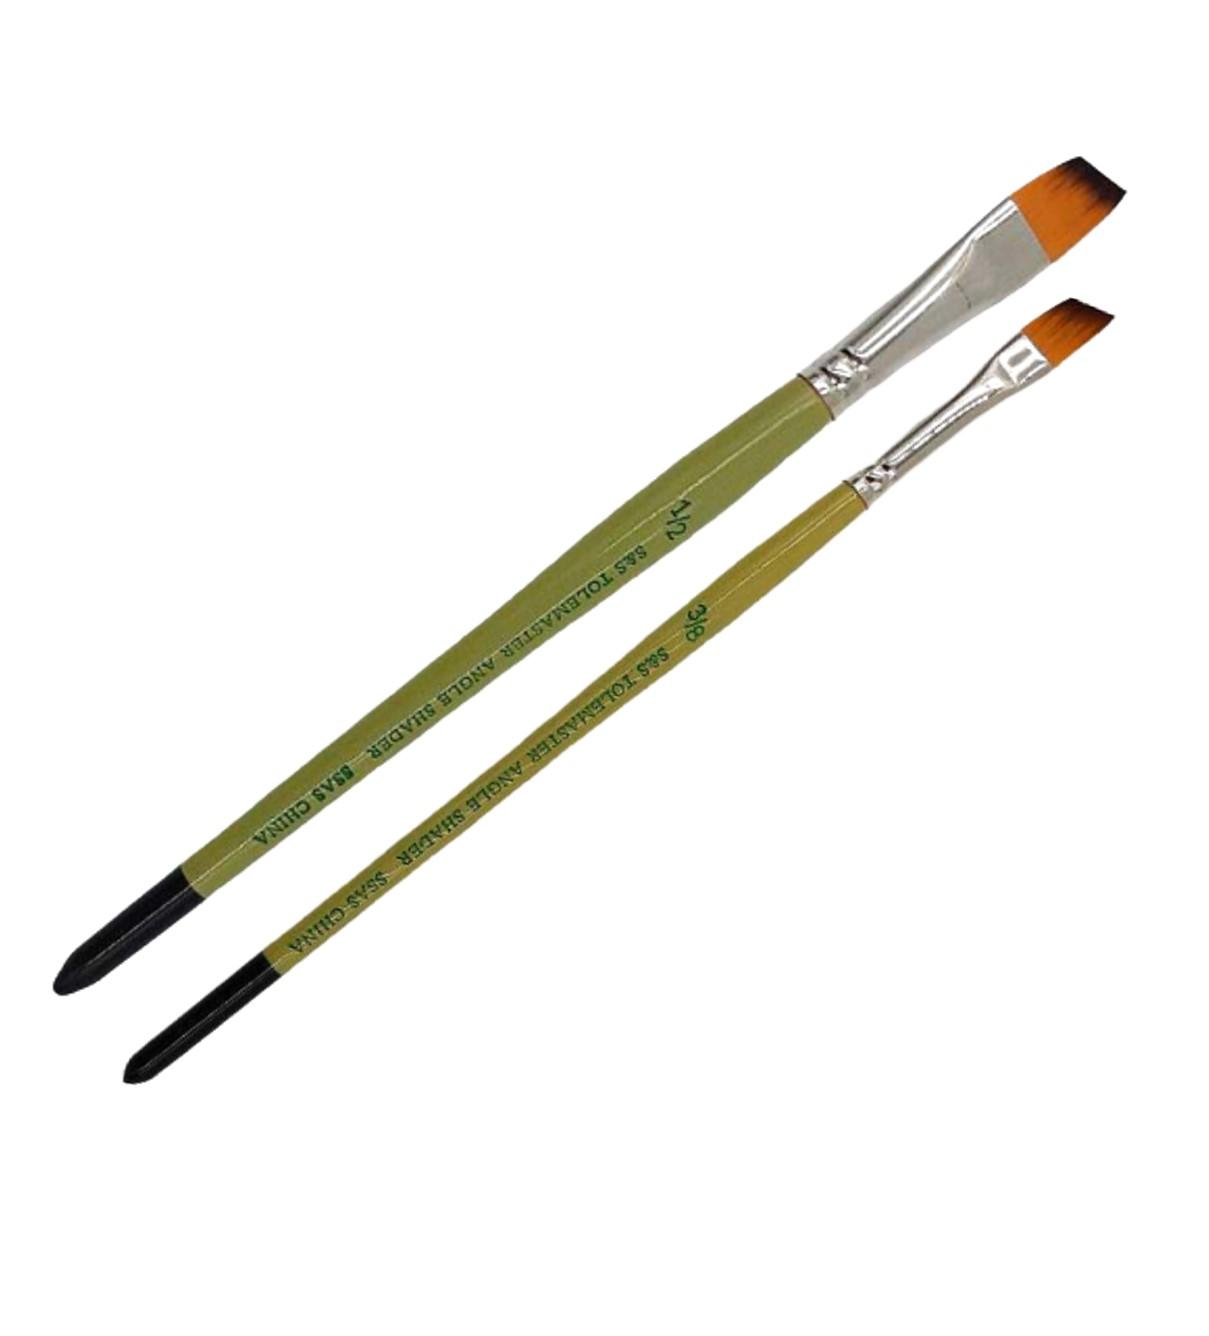 Tolemaster Angle Shader Brushes